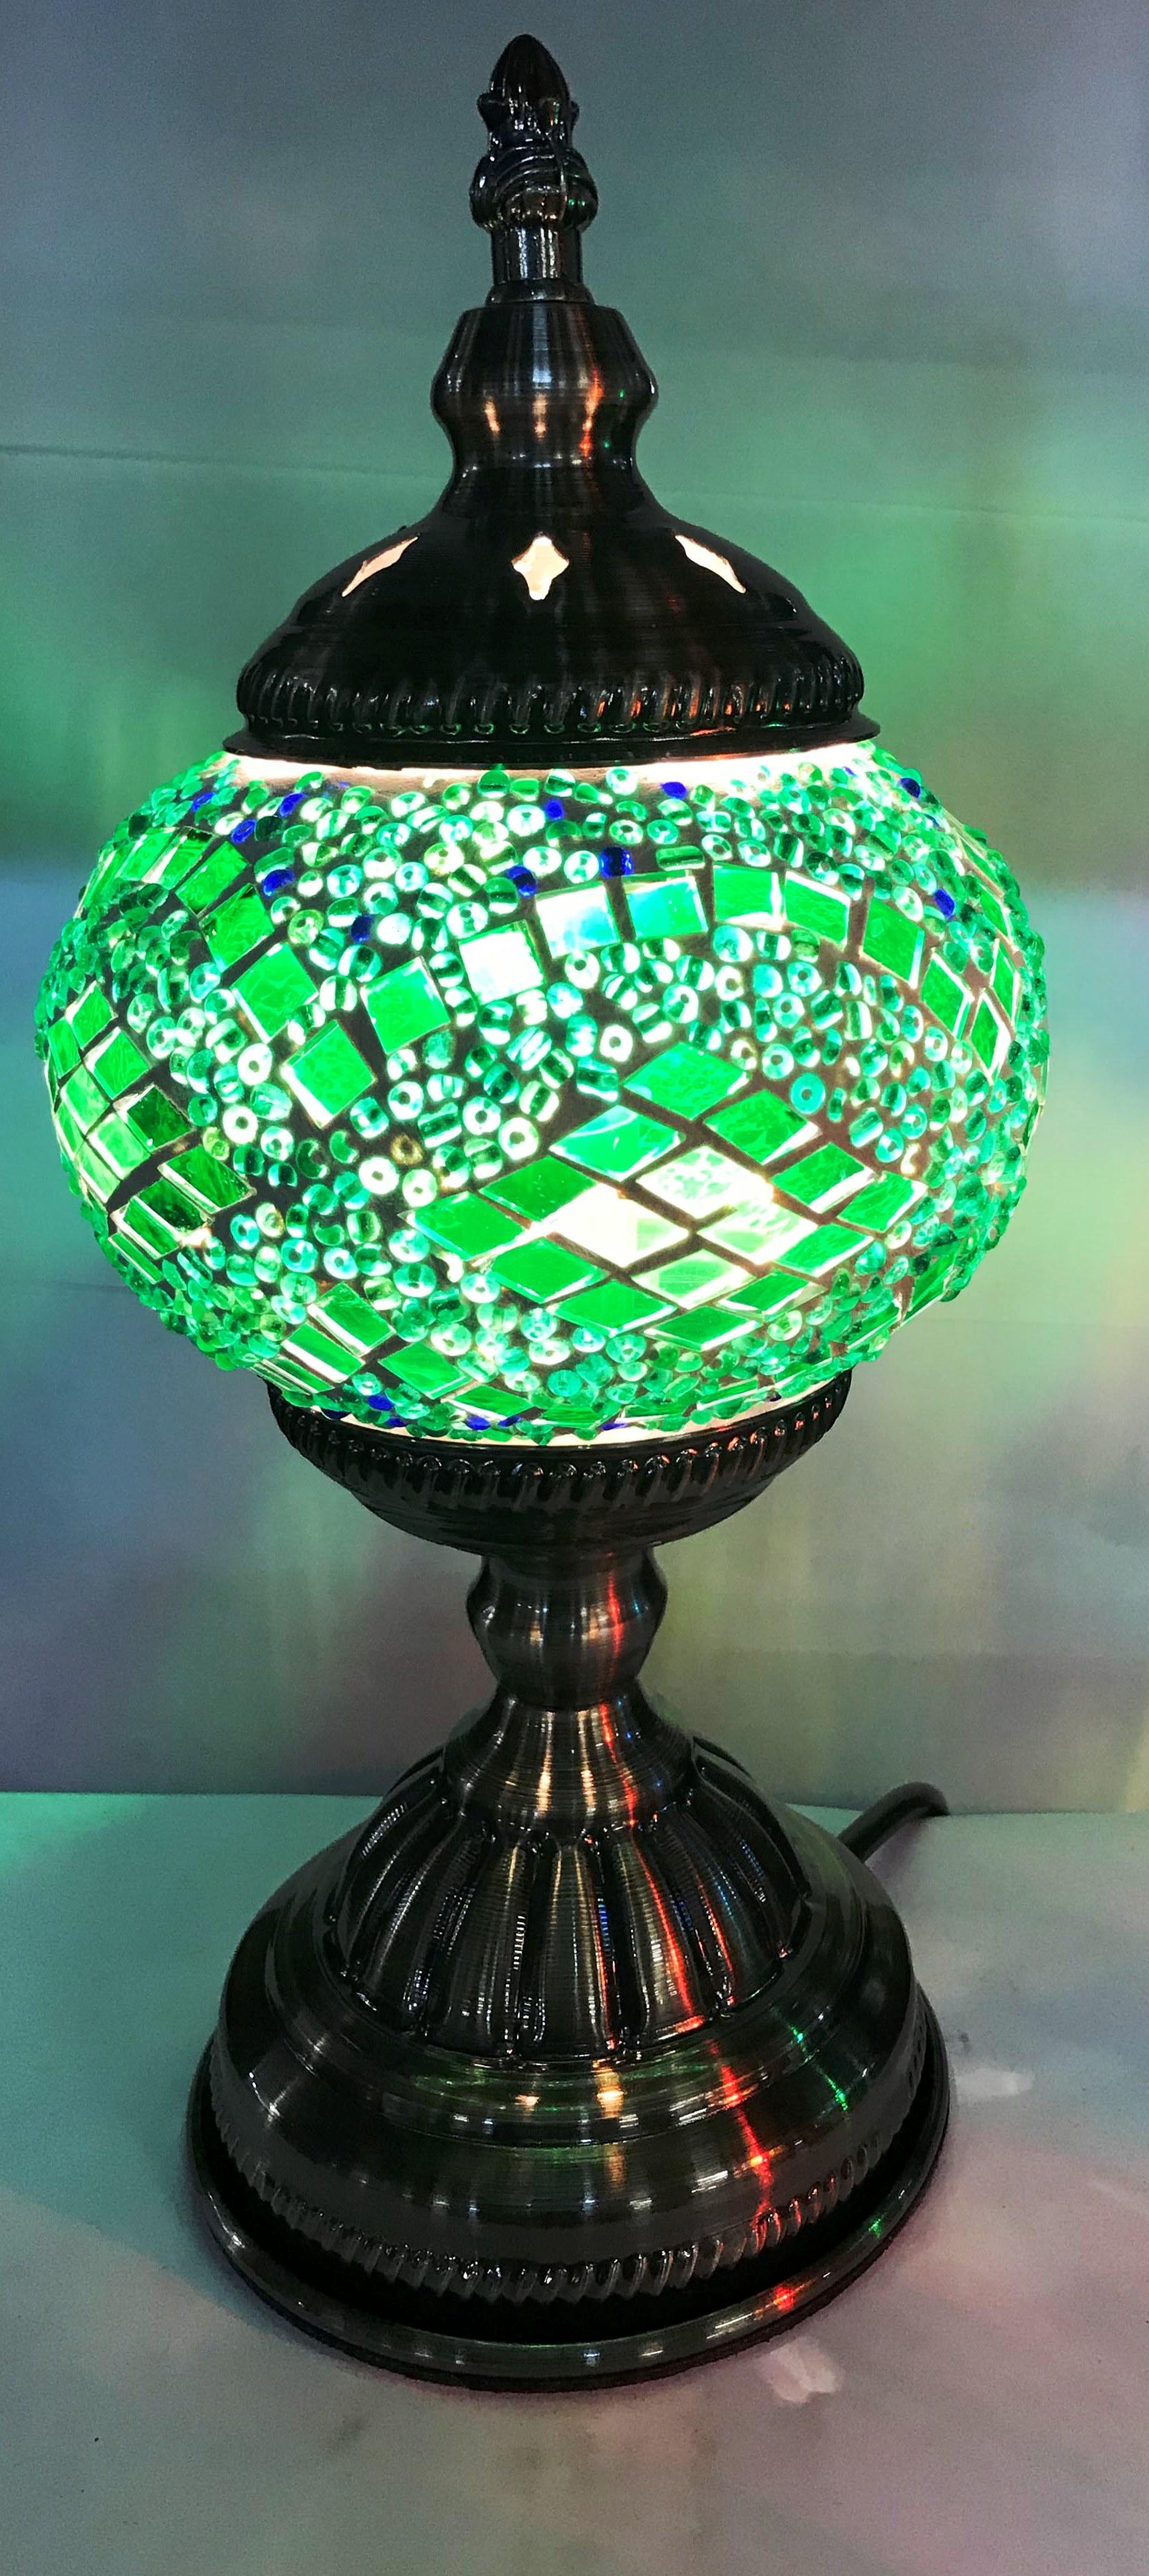 Moroc lamp - Grn